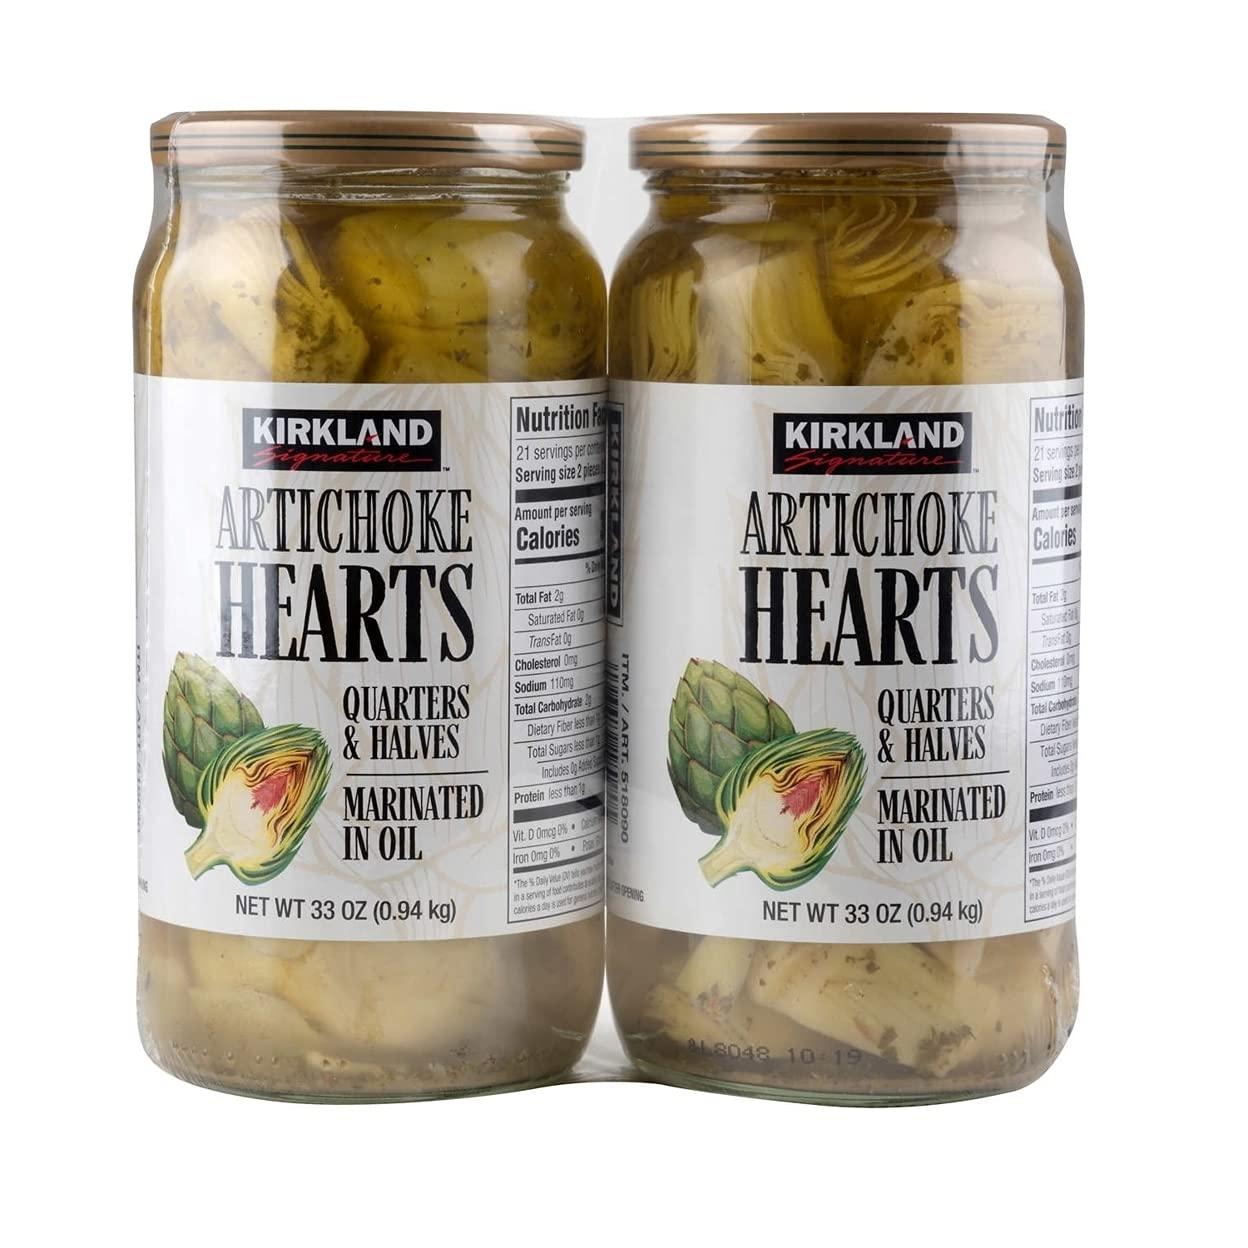 Kirkland Under blast sales Signature Artichoke Hearts Regular dealer 66 Ounce